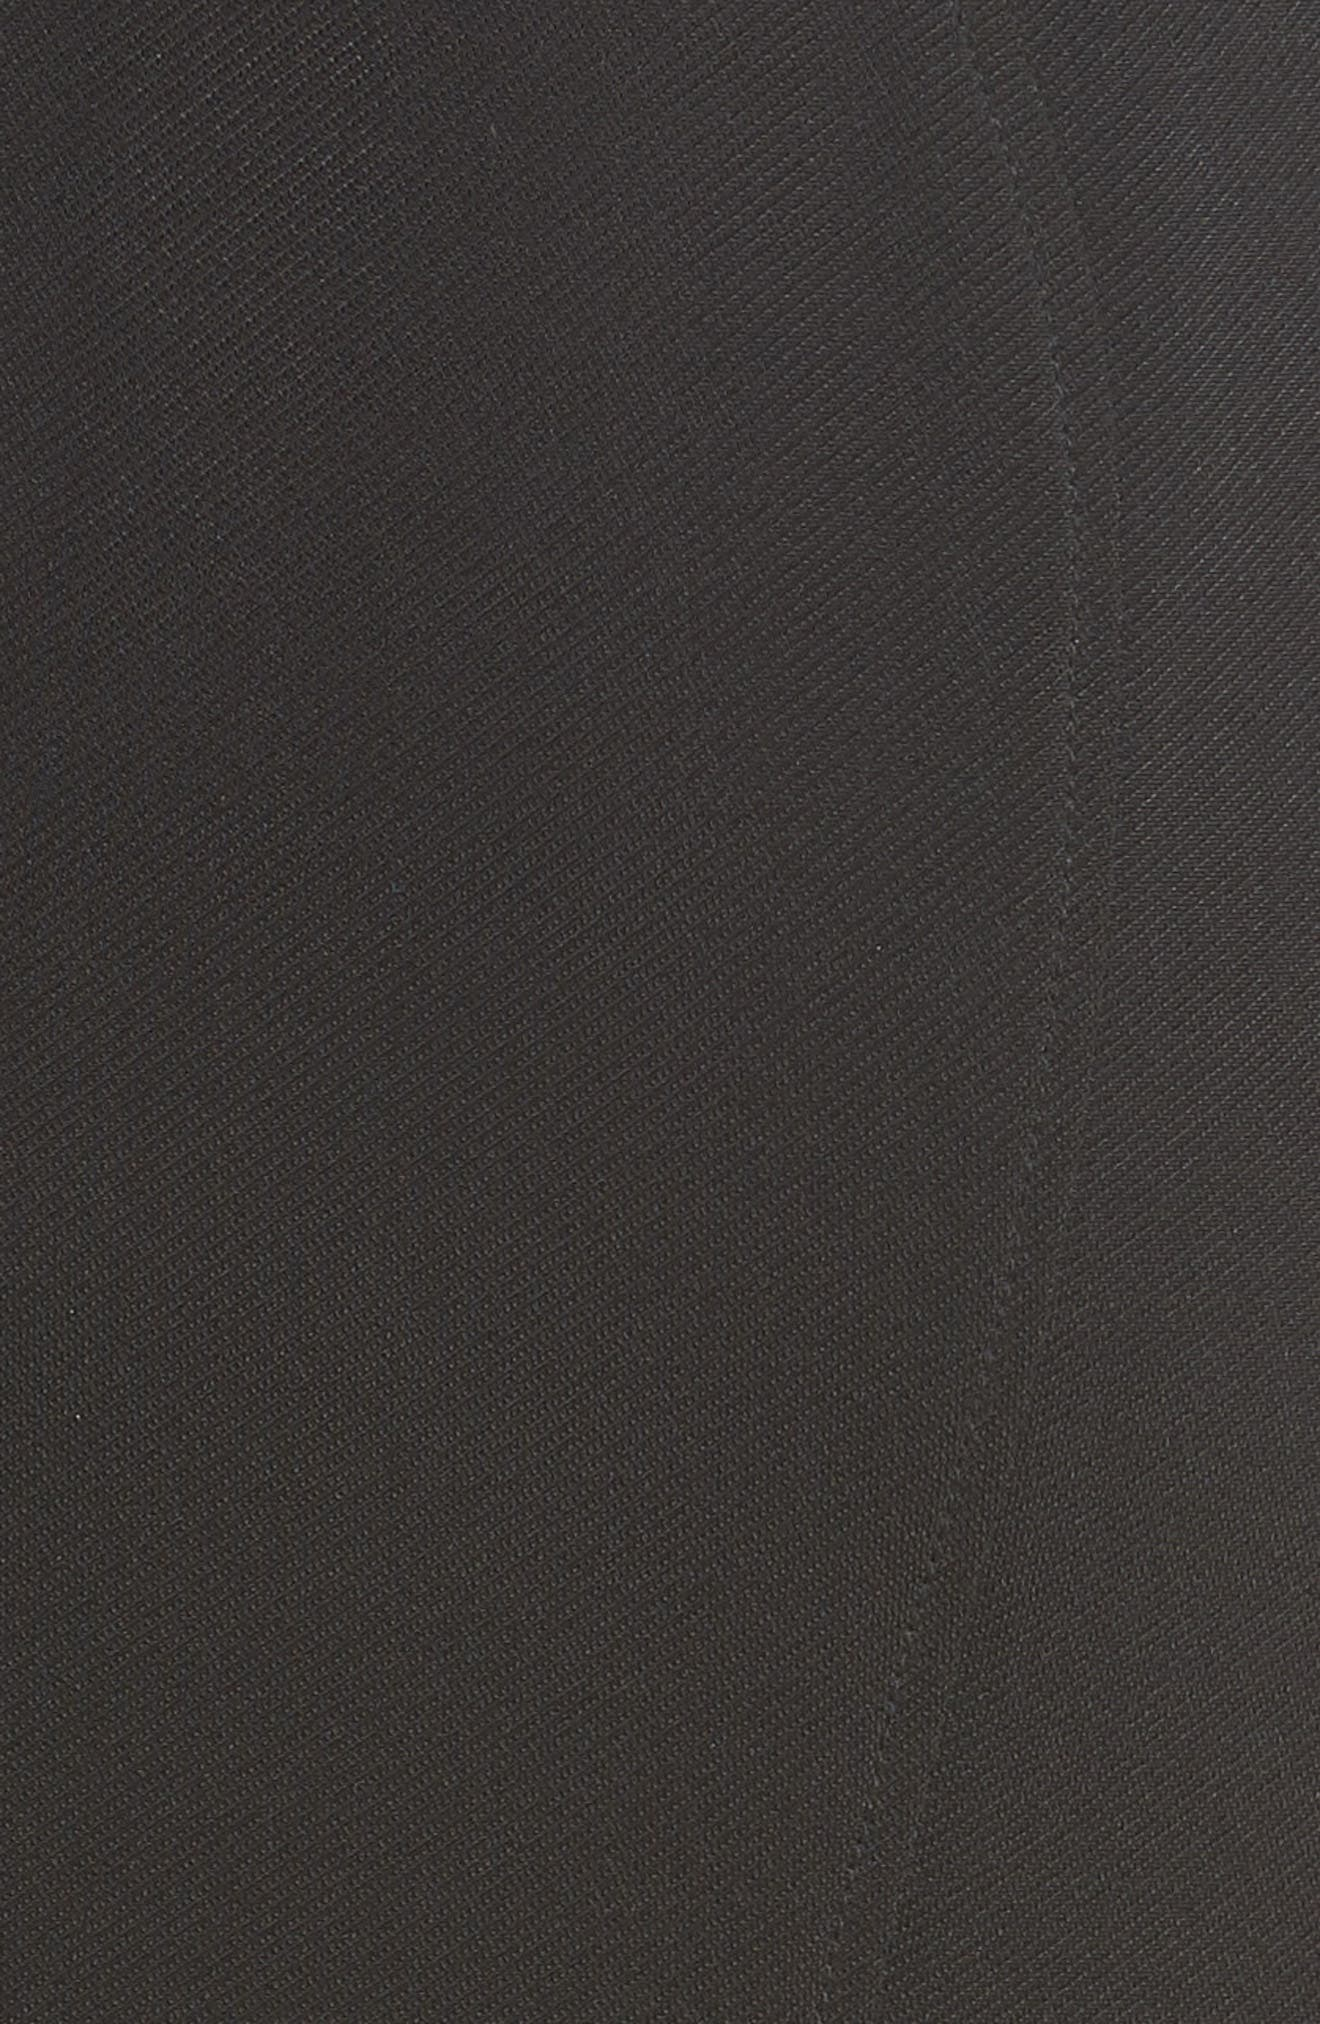 ZAC ZAC POSEN, Sirena Body-Con Dress, Alternate thumbnail 6, color, BLACK